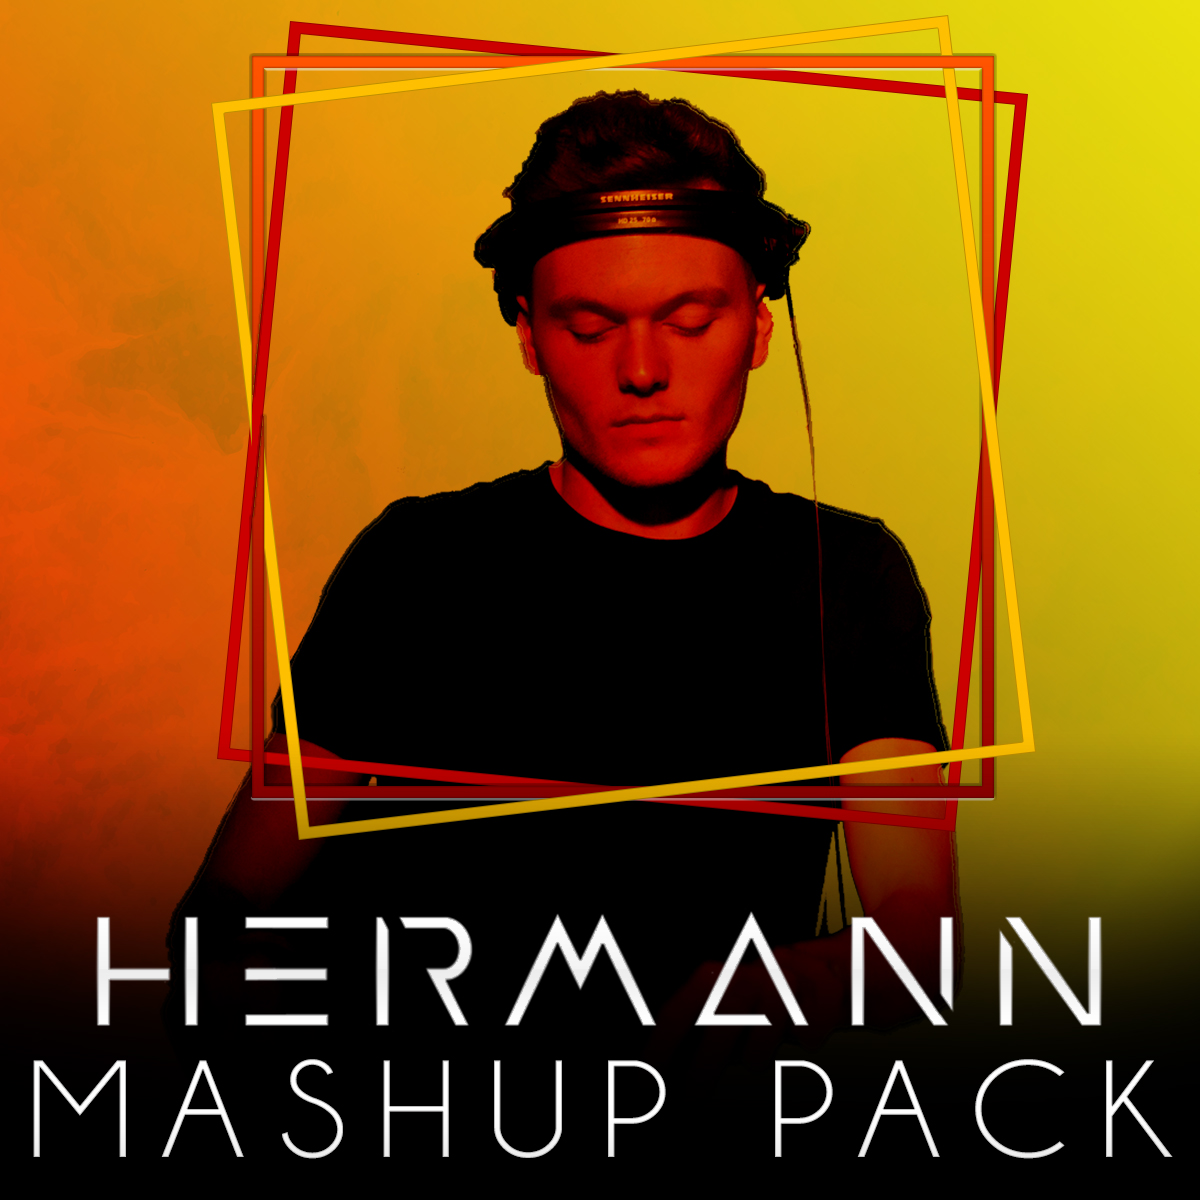 HERMANN & Friends Mashup Pack